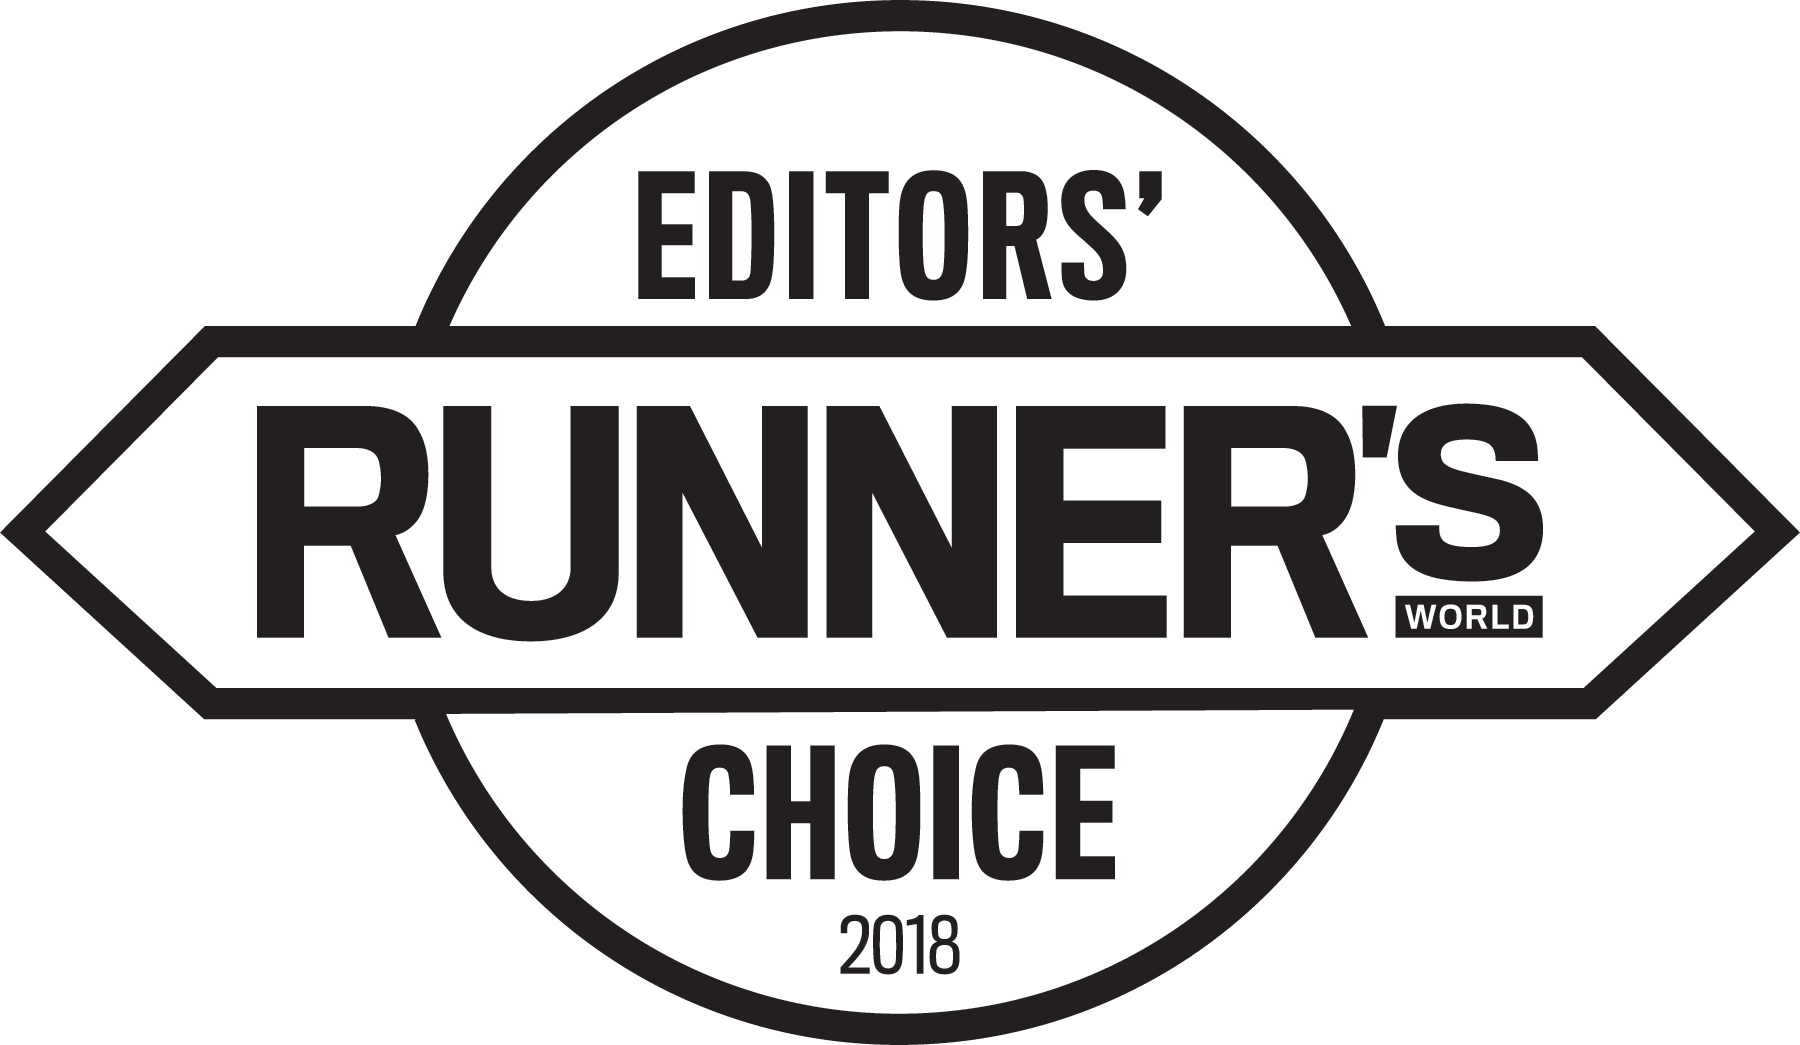 Runners - Editor's Choice 2018